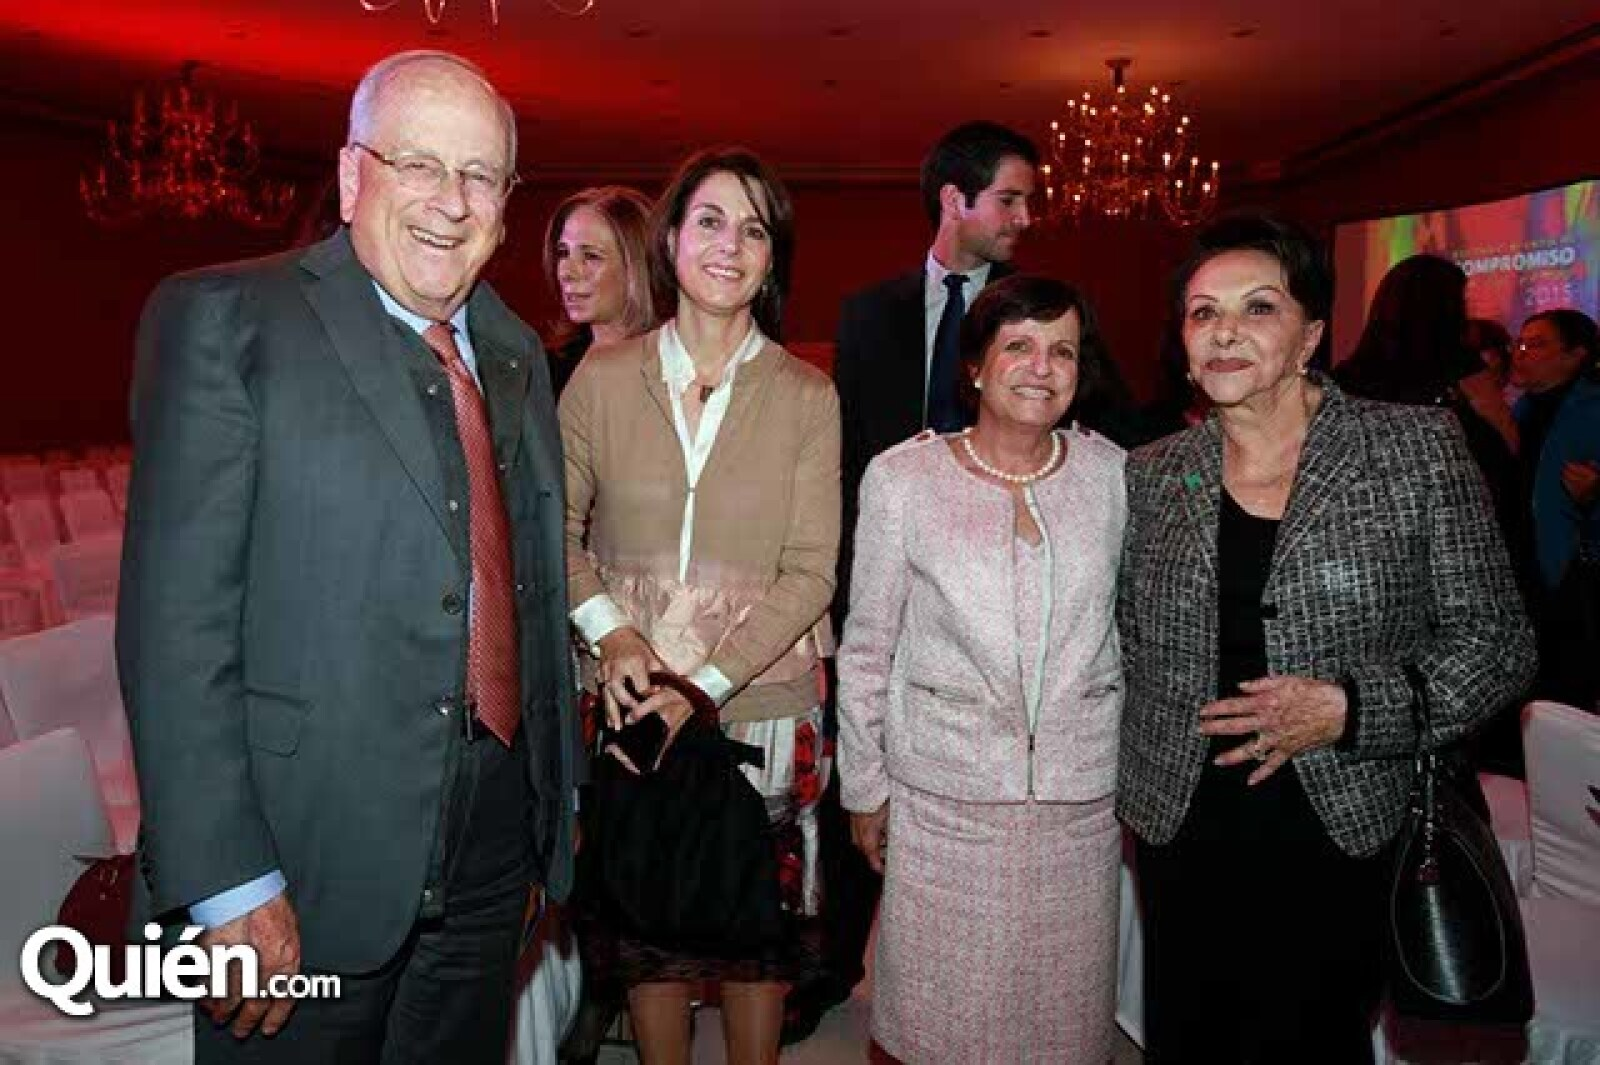 Claudio González,Viviana Rivera,Marisa Laresgoiti y Tere Huajardo